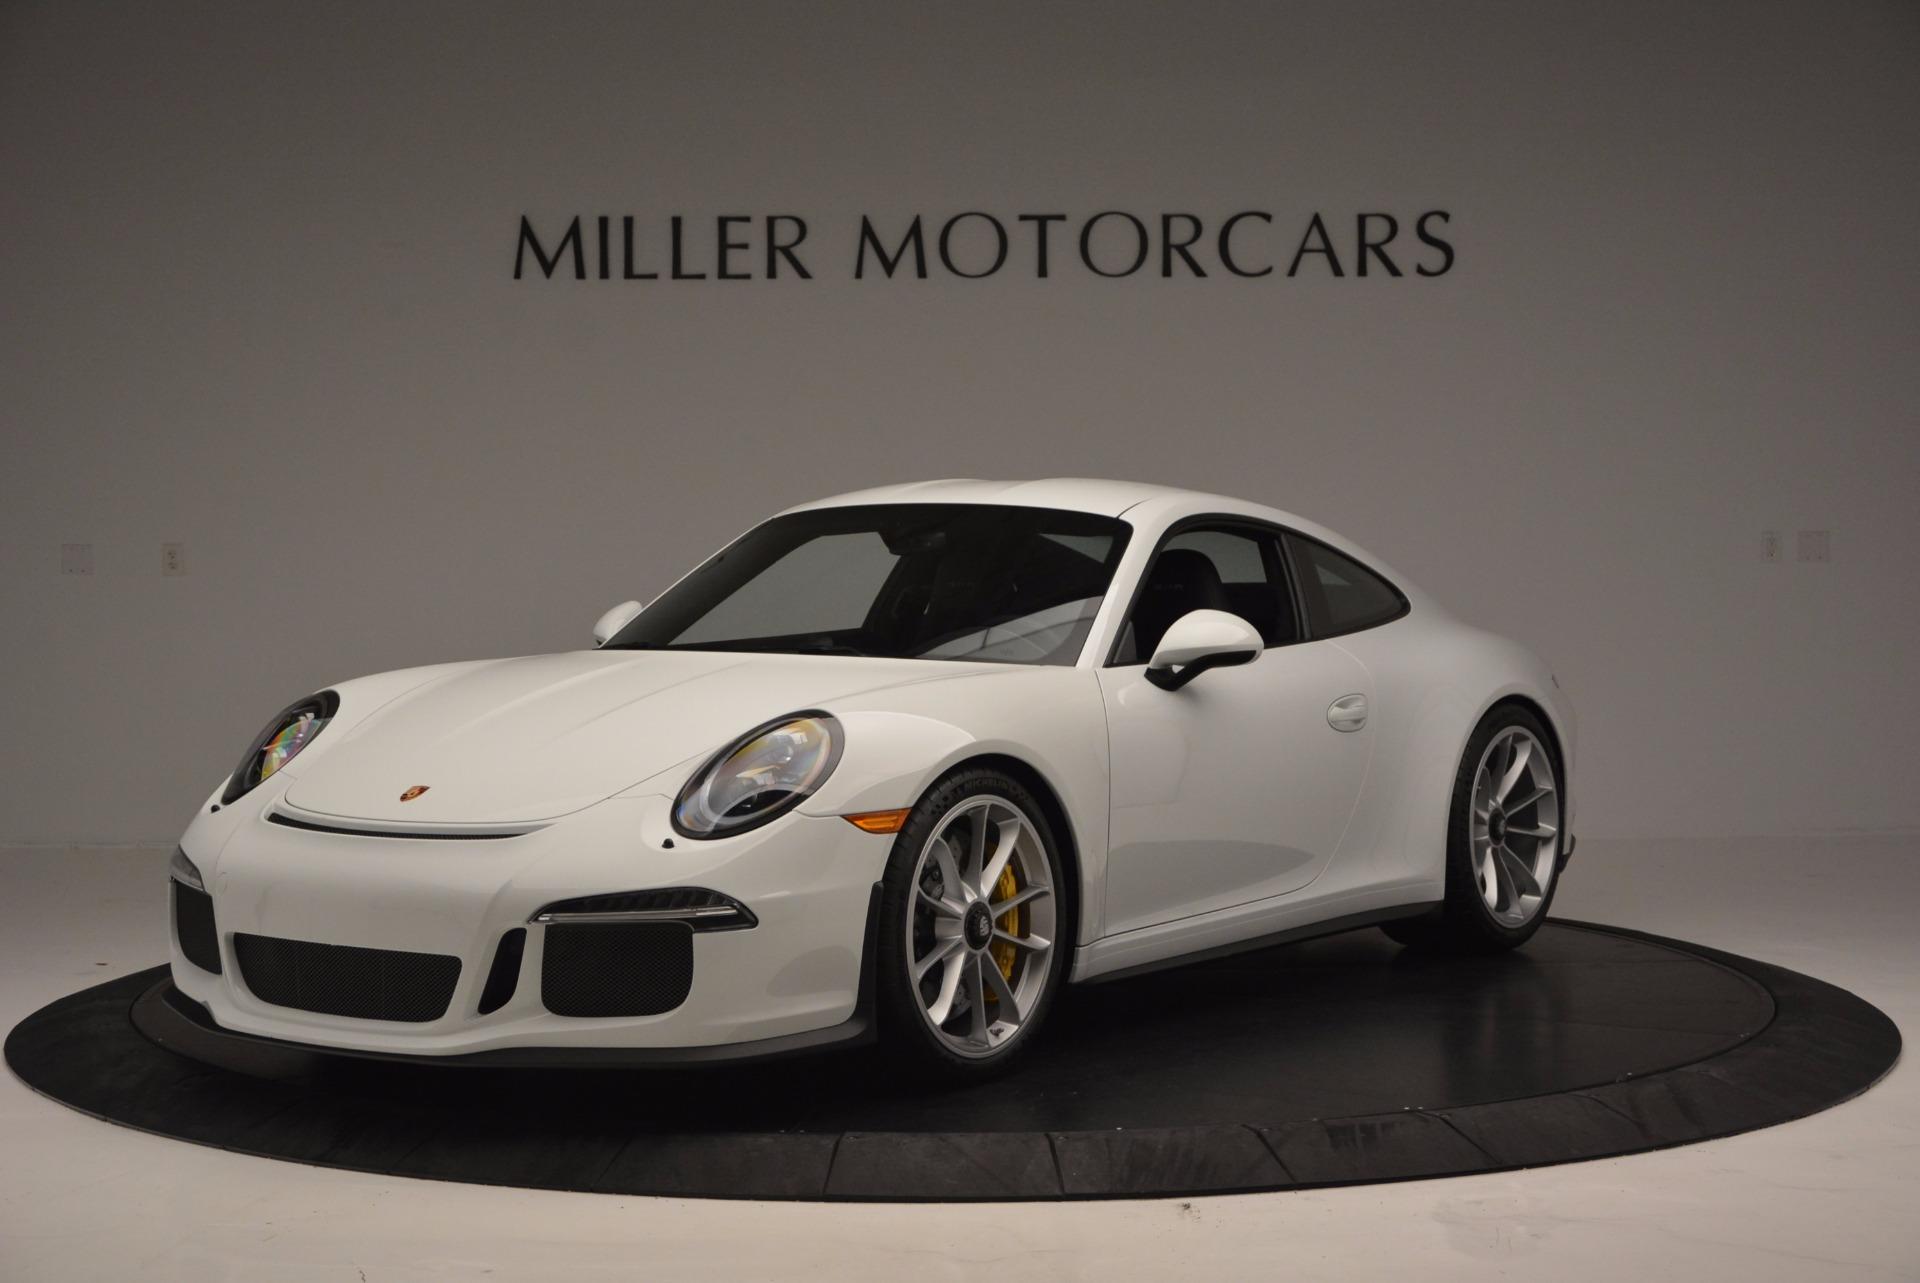 Used 2016 Porsche 911 R for sale Sold at Bugatti of Greenwich in Greenwich CT 06830 1